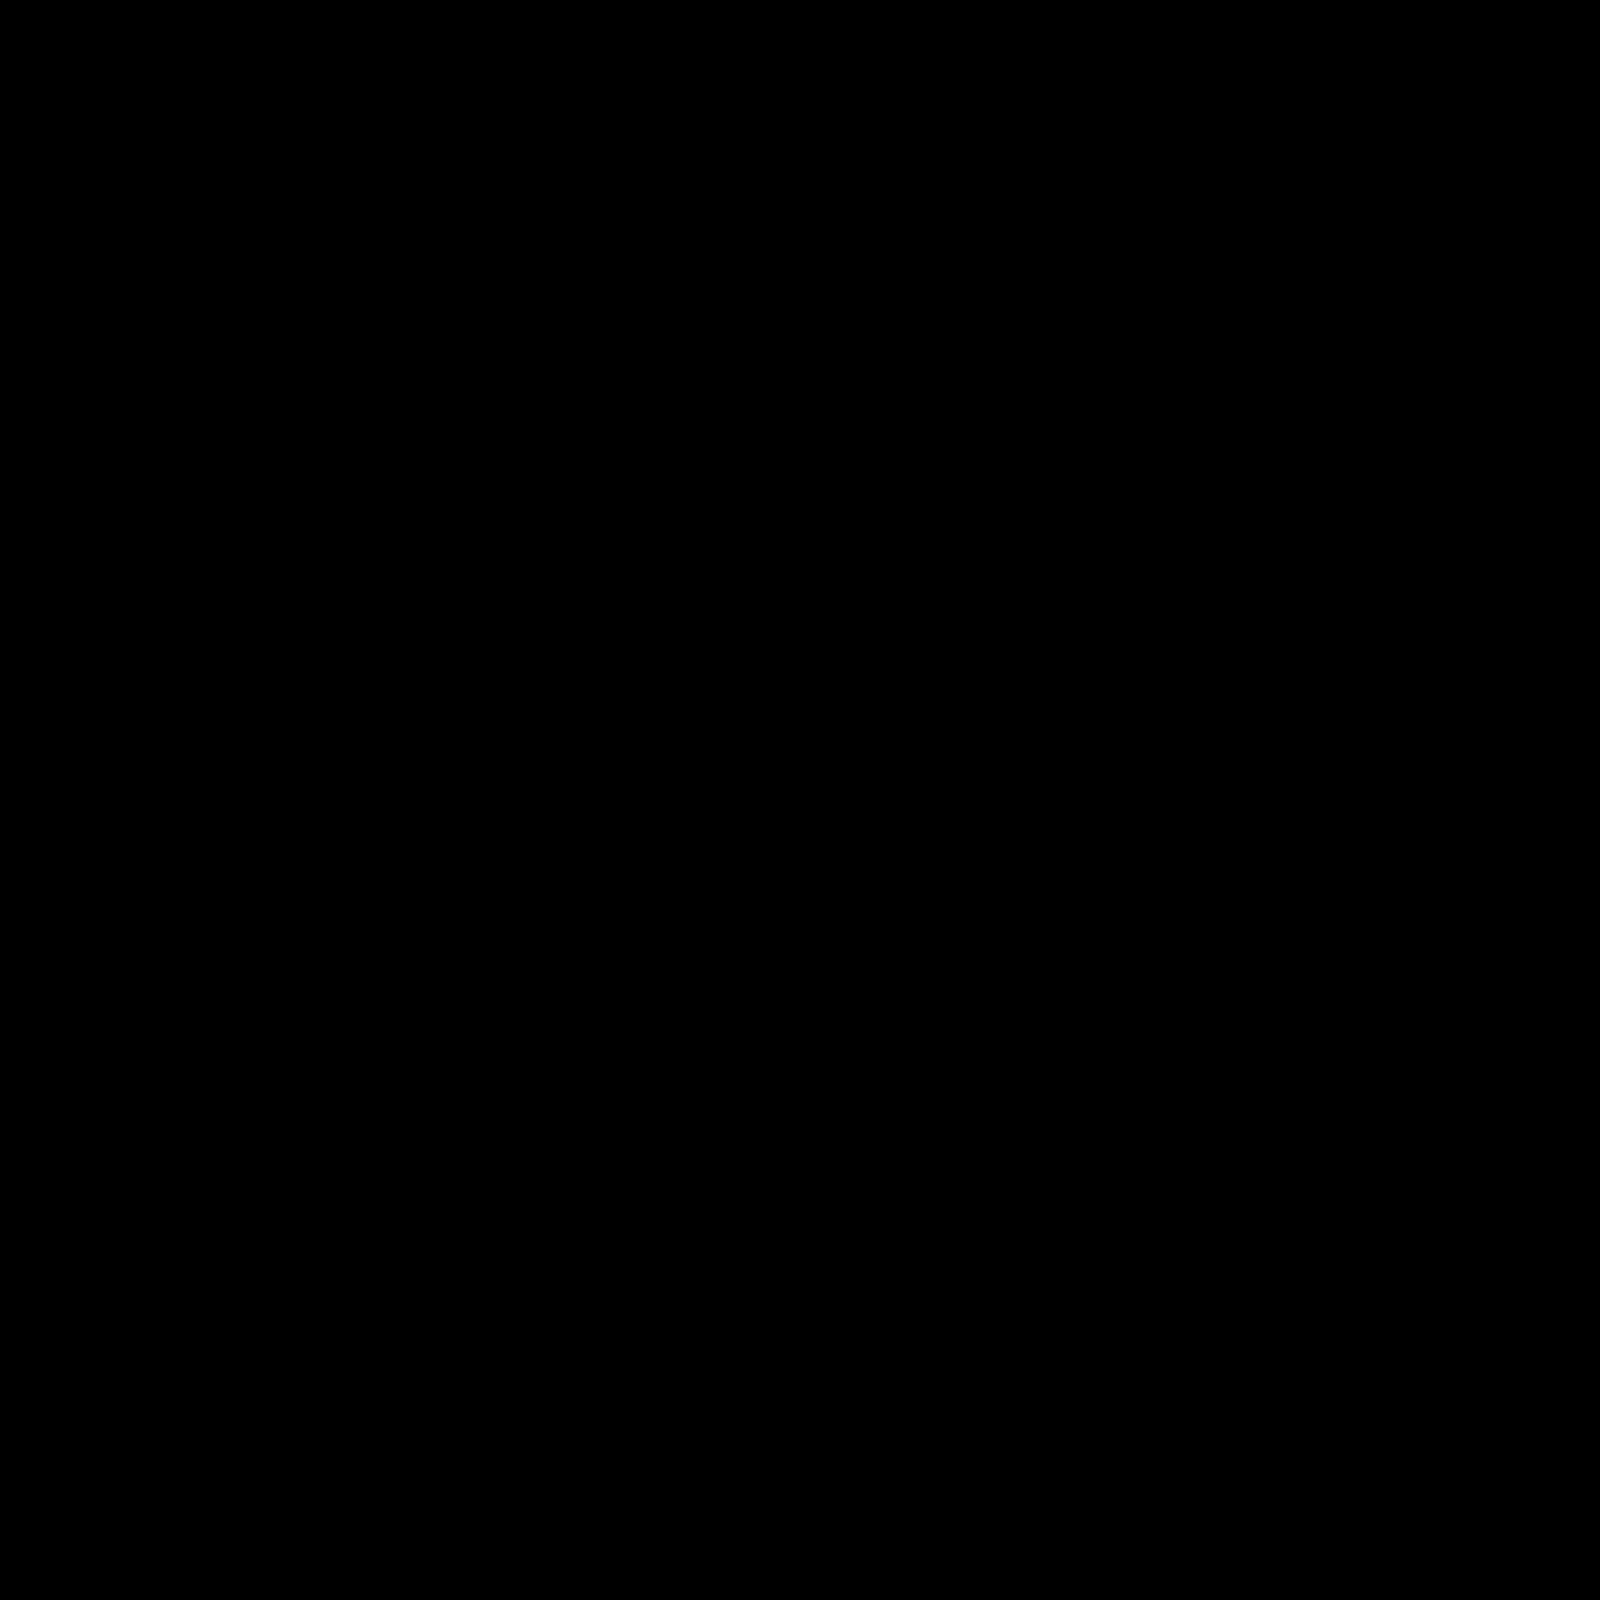 Brak synchronizacji icon